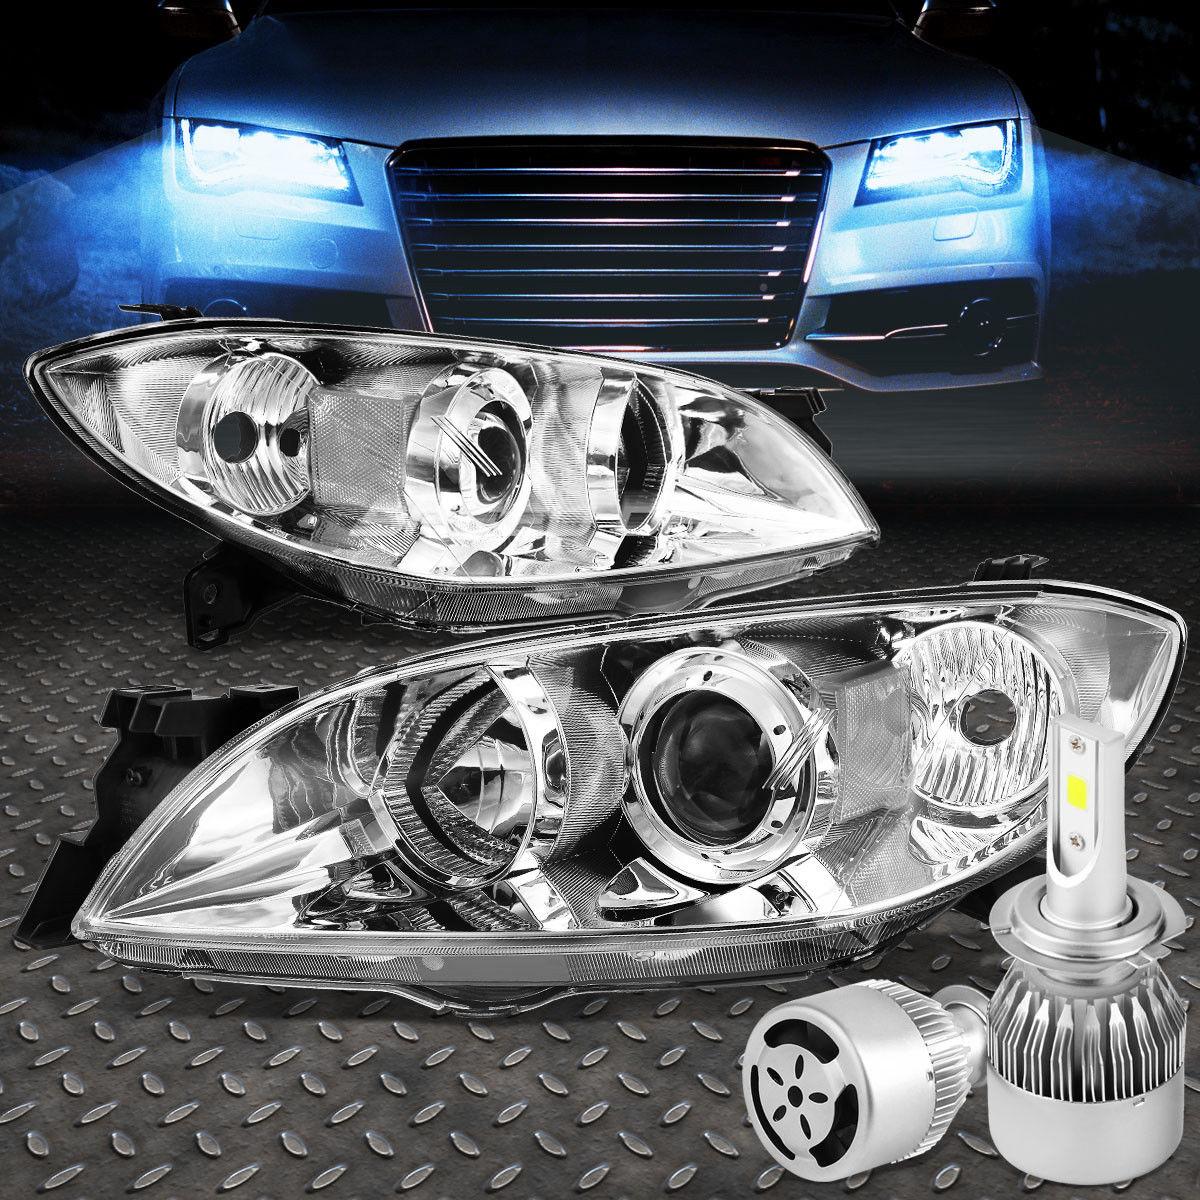 Hid Headlight Repair 2004 To 2020 Mazda 3 Forum And Mazdaspeed 3 Forums